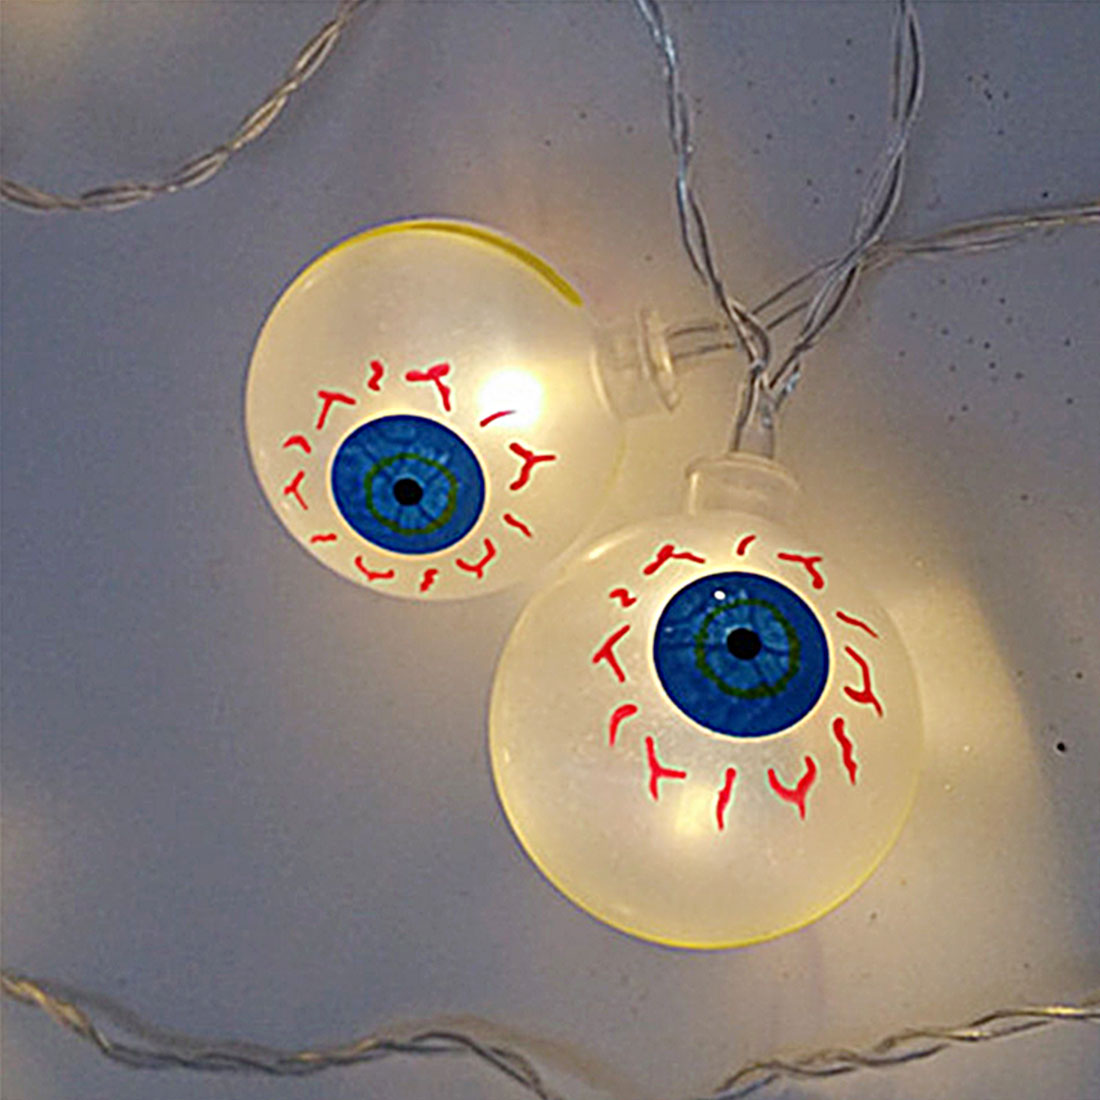 Hot Best 10LED 1.2M Eyeballs Halloween Decor LED String Lights Lanterns Lamp for DIY Home Bar Outdoor Party Supplies